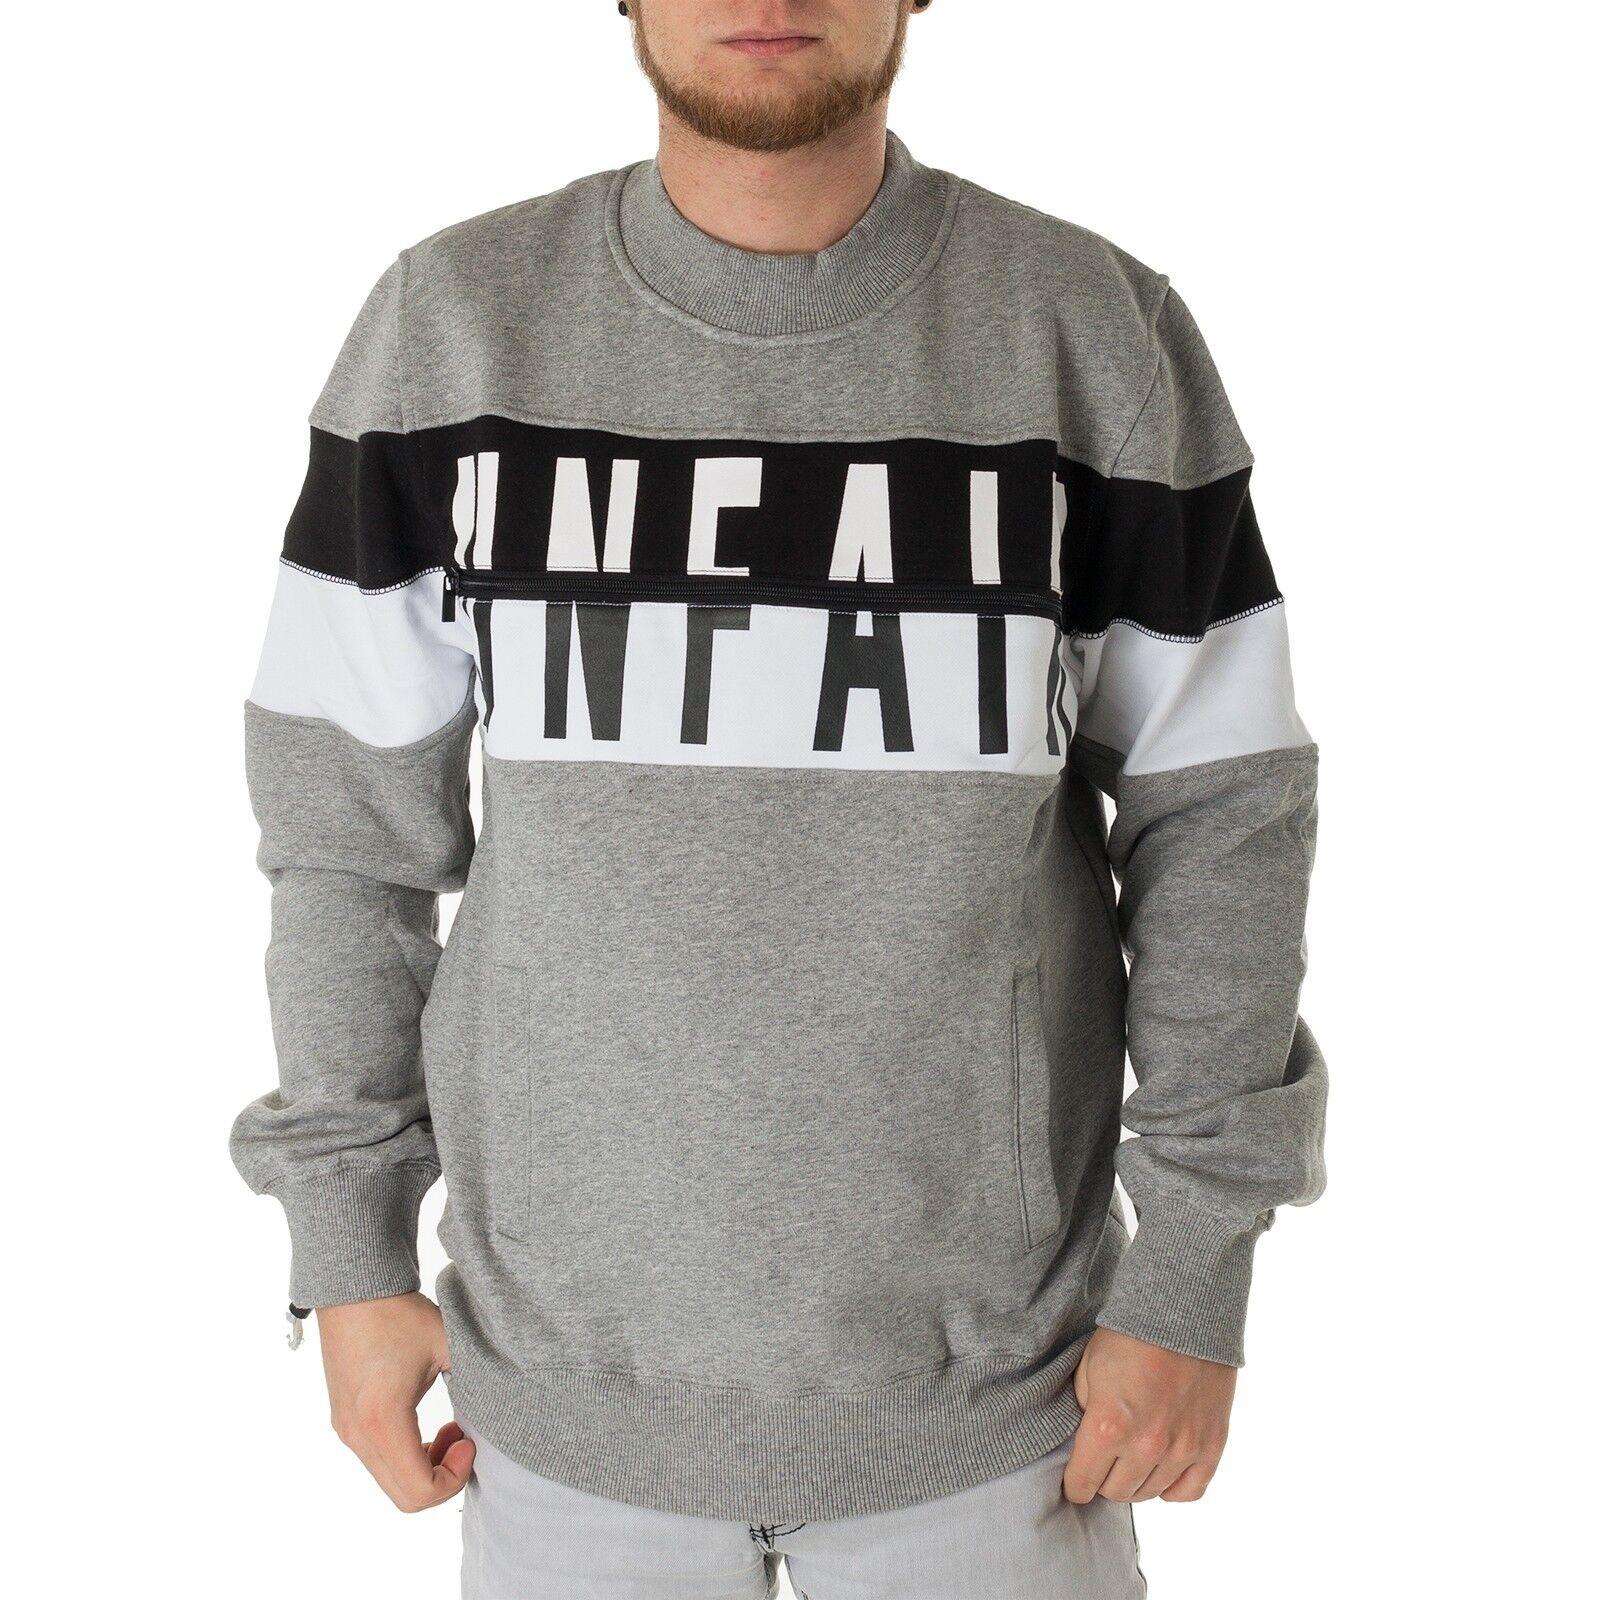 Unfair Athletics Sweater Contrast Herren Sweatpulli Heather Grau 33689